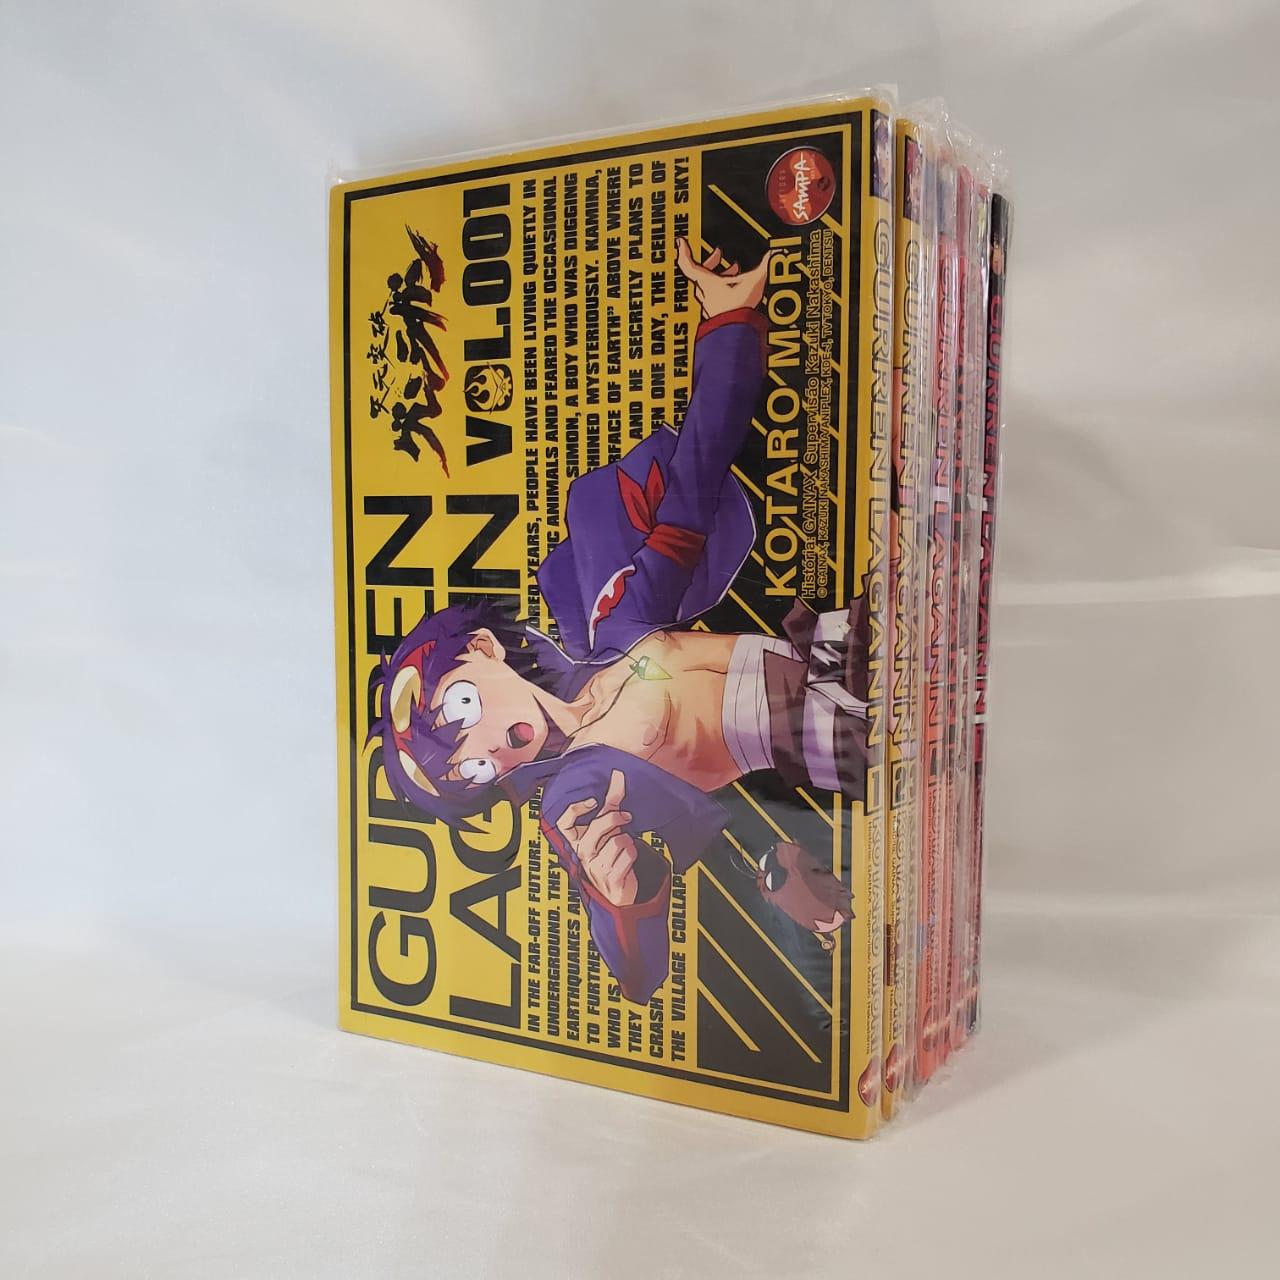 Gurren Lagann - 1 ao 7 - Pack